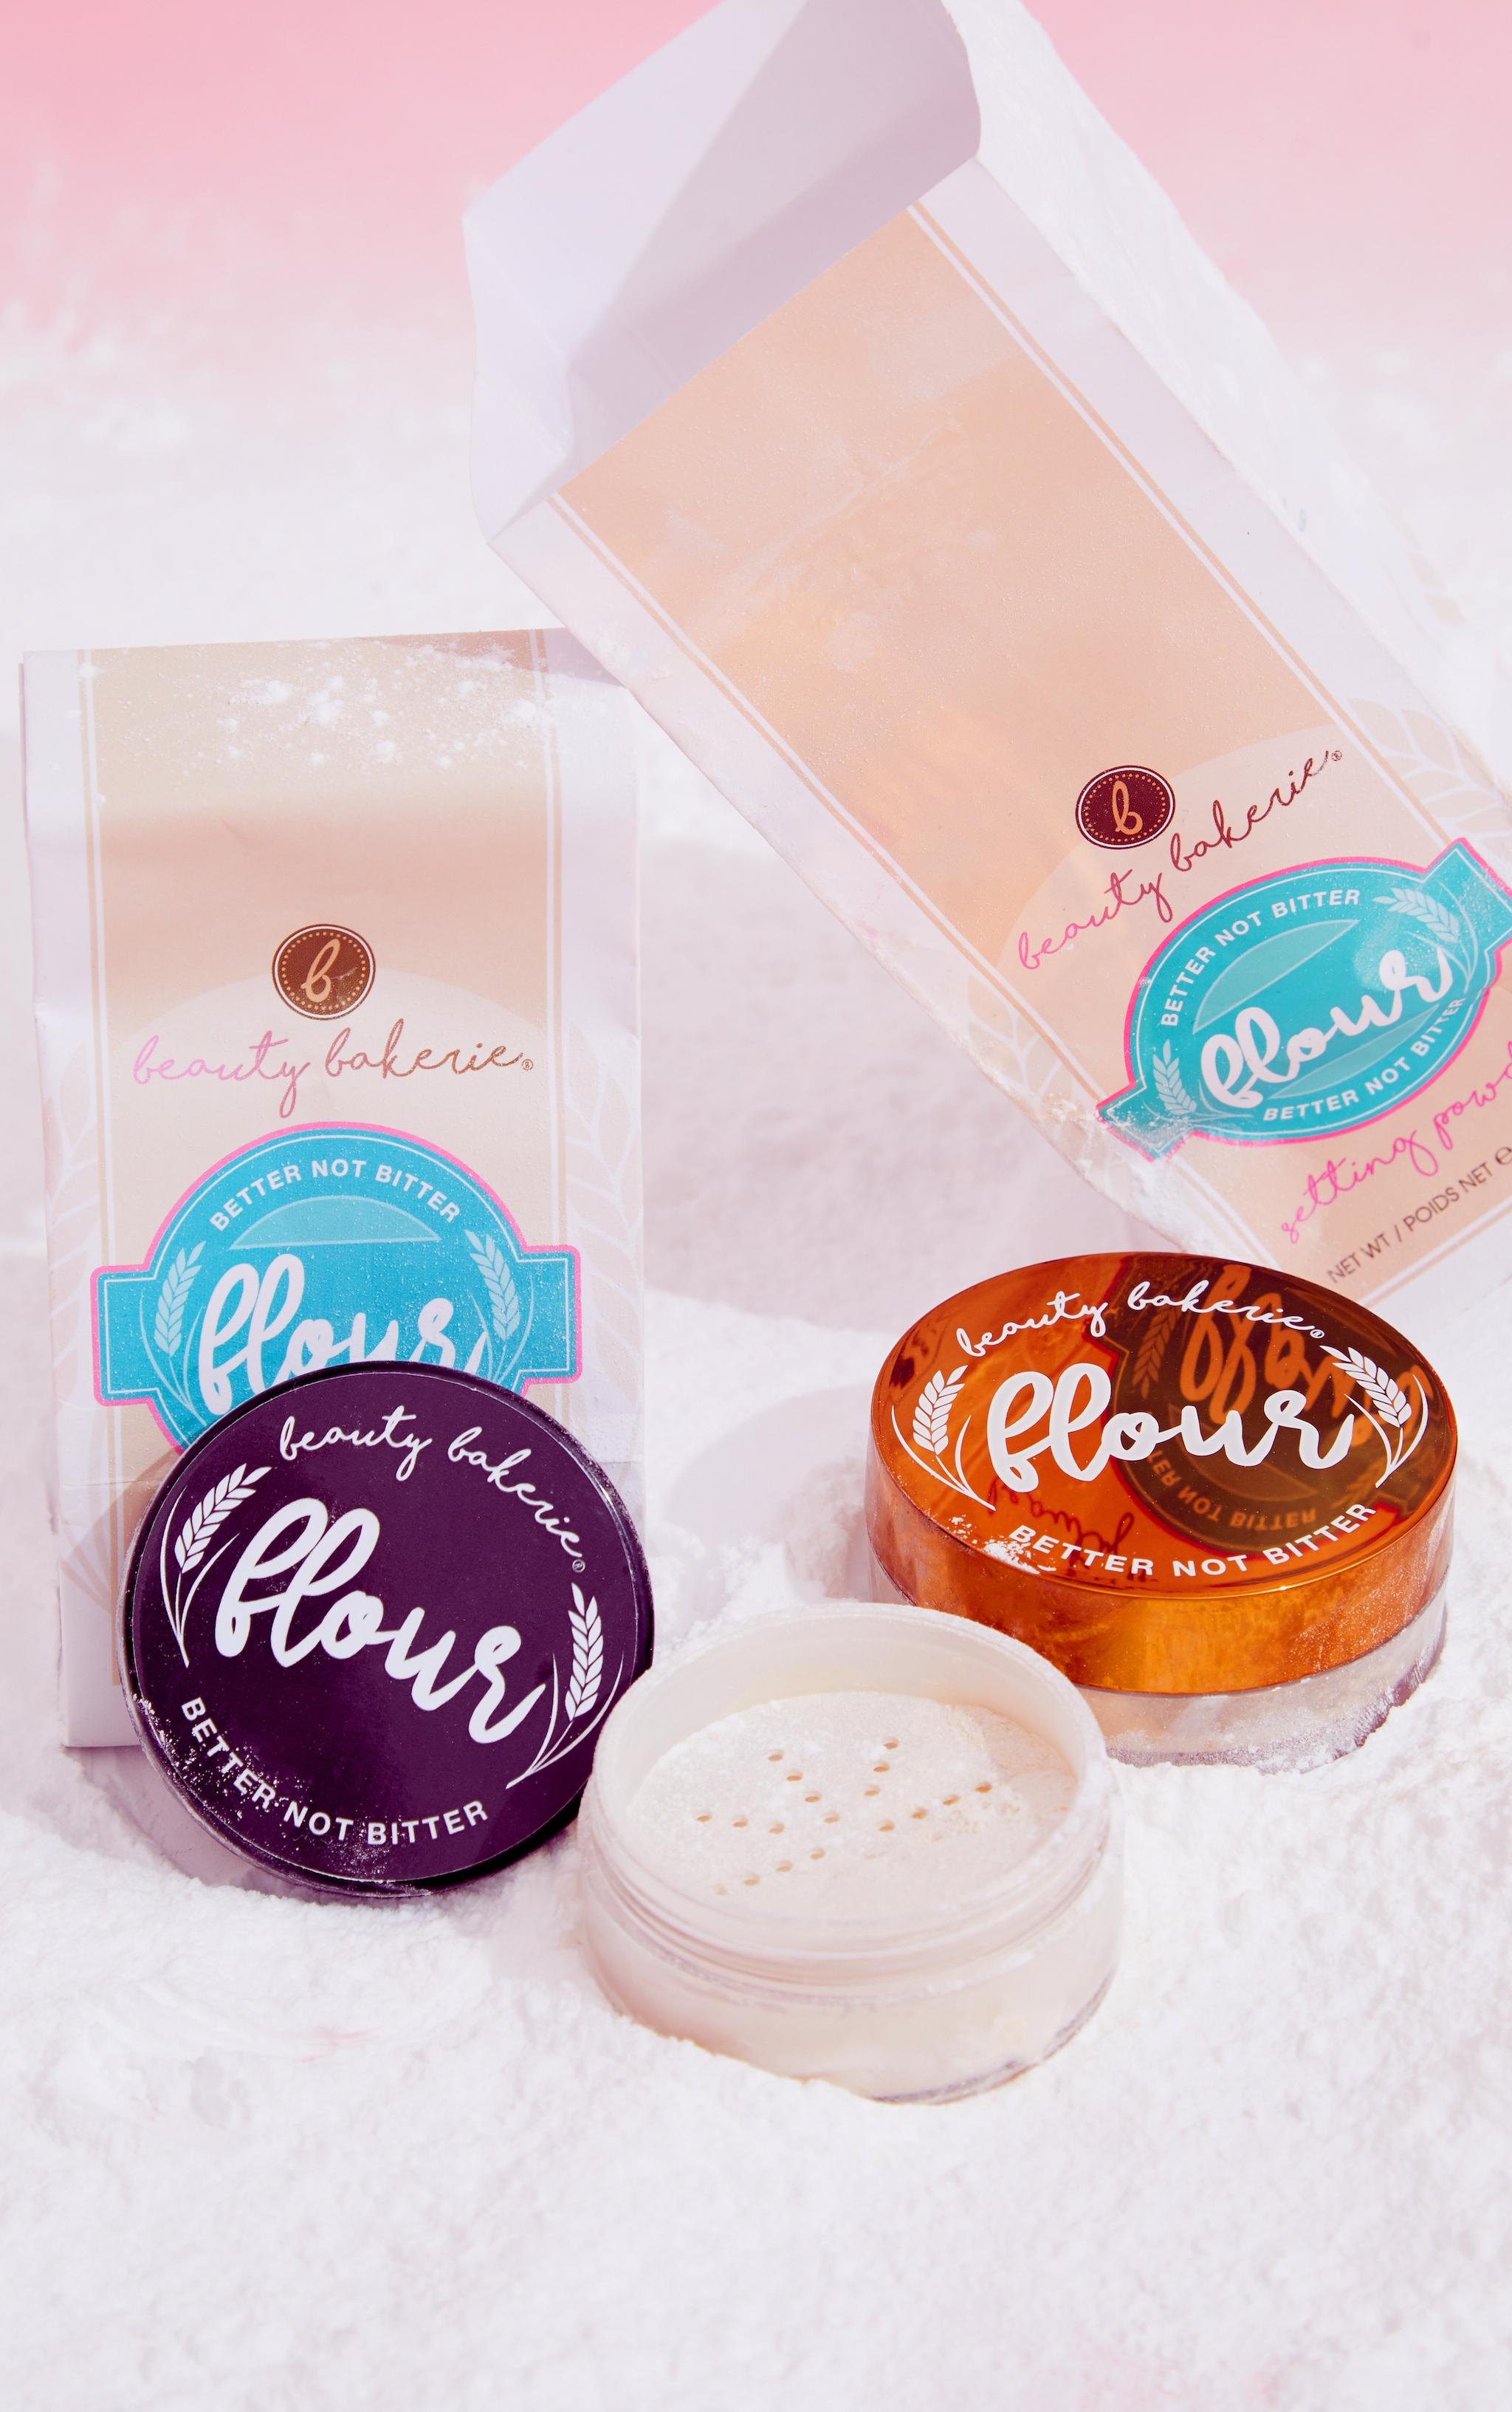 Beauty Bakerie Setting Powder Translucent Flour 3